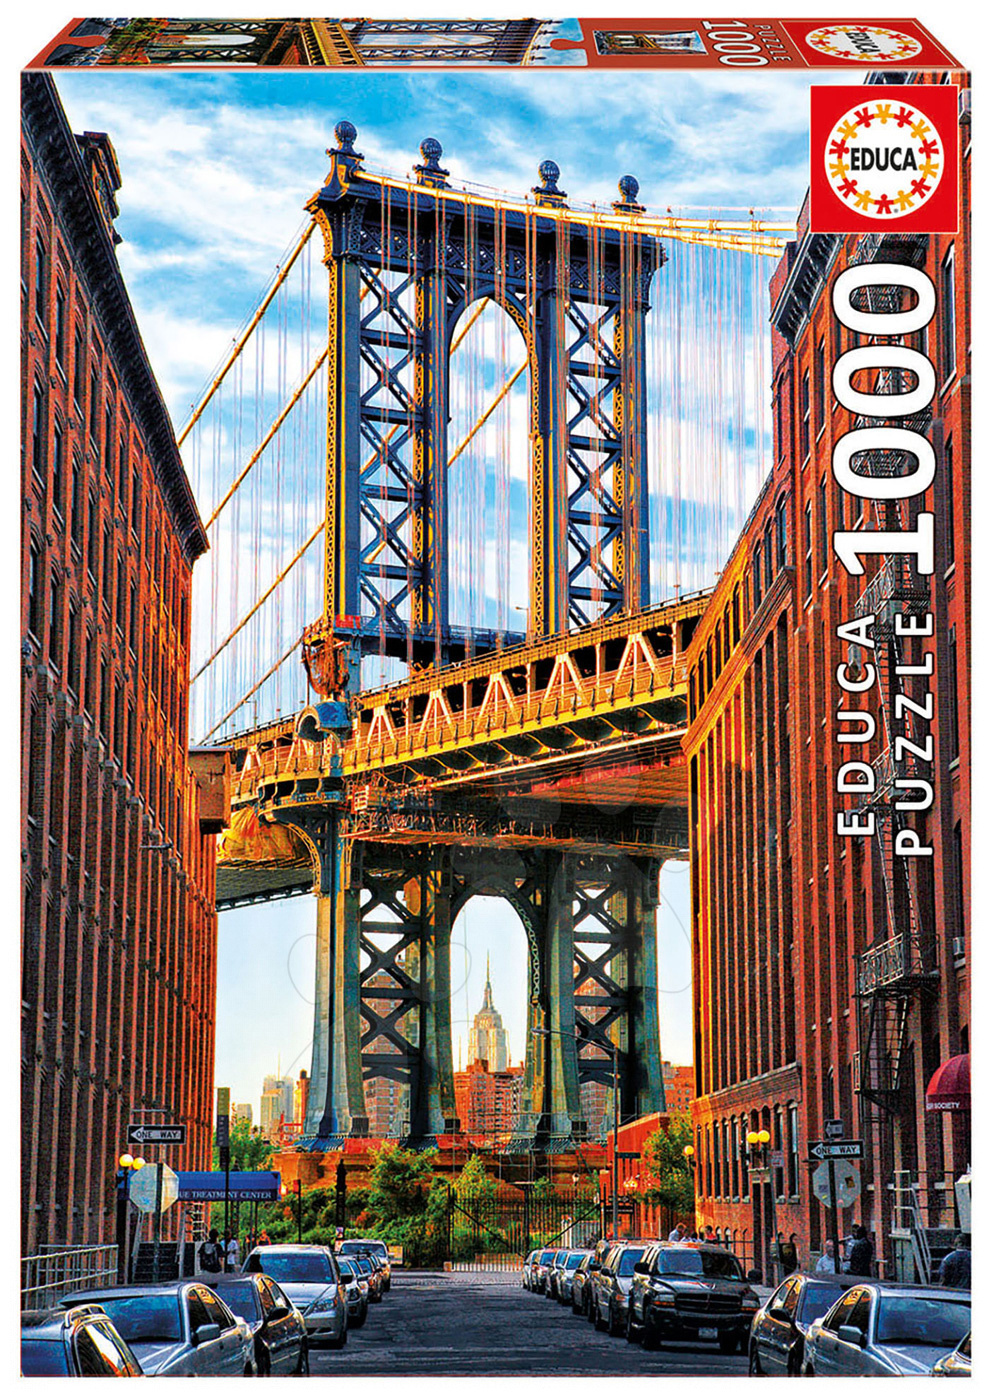 Puzzle Genuine Manhattan Bridge, New York Educa 1000 dílů od 11 let